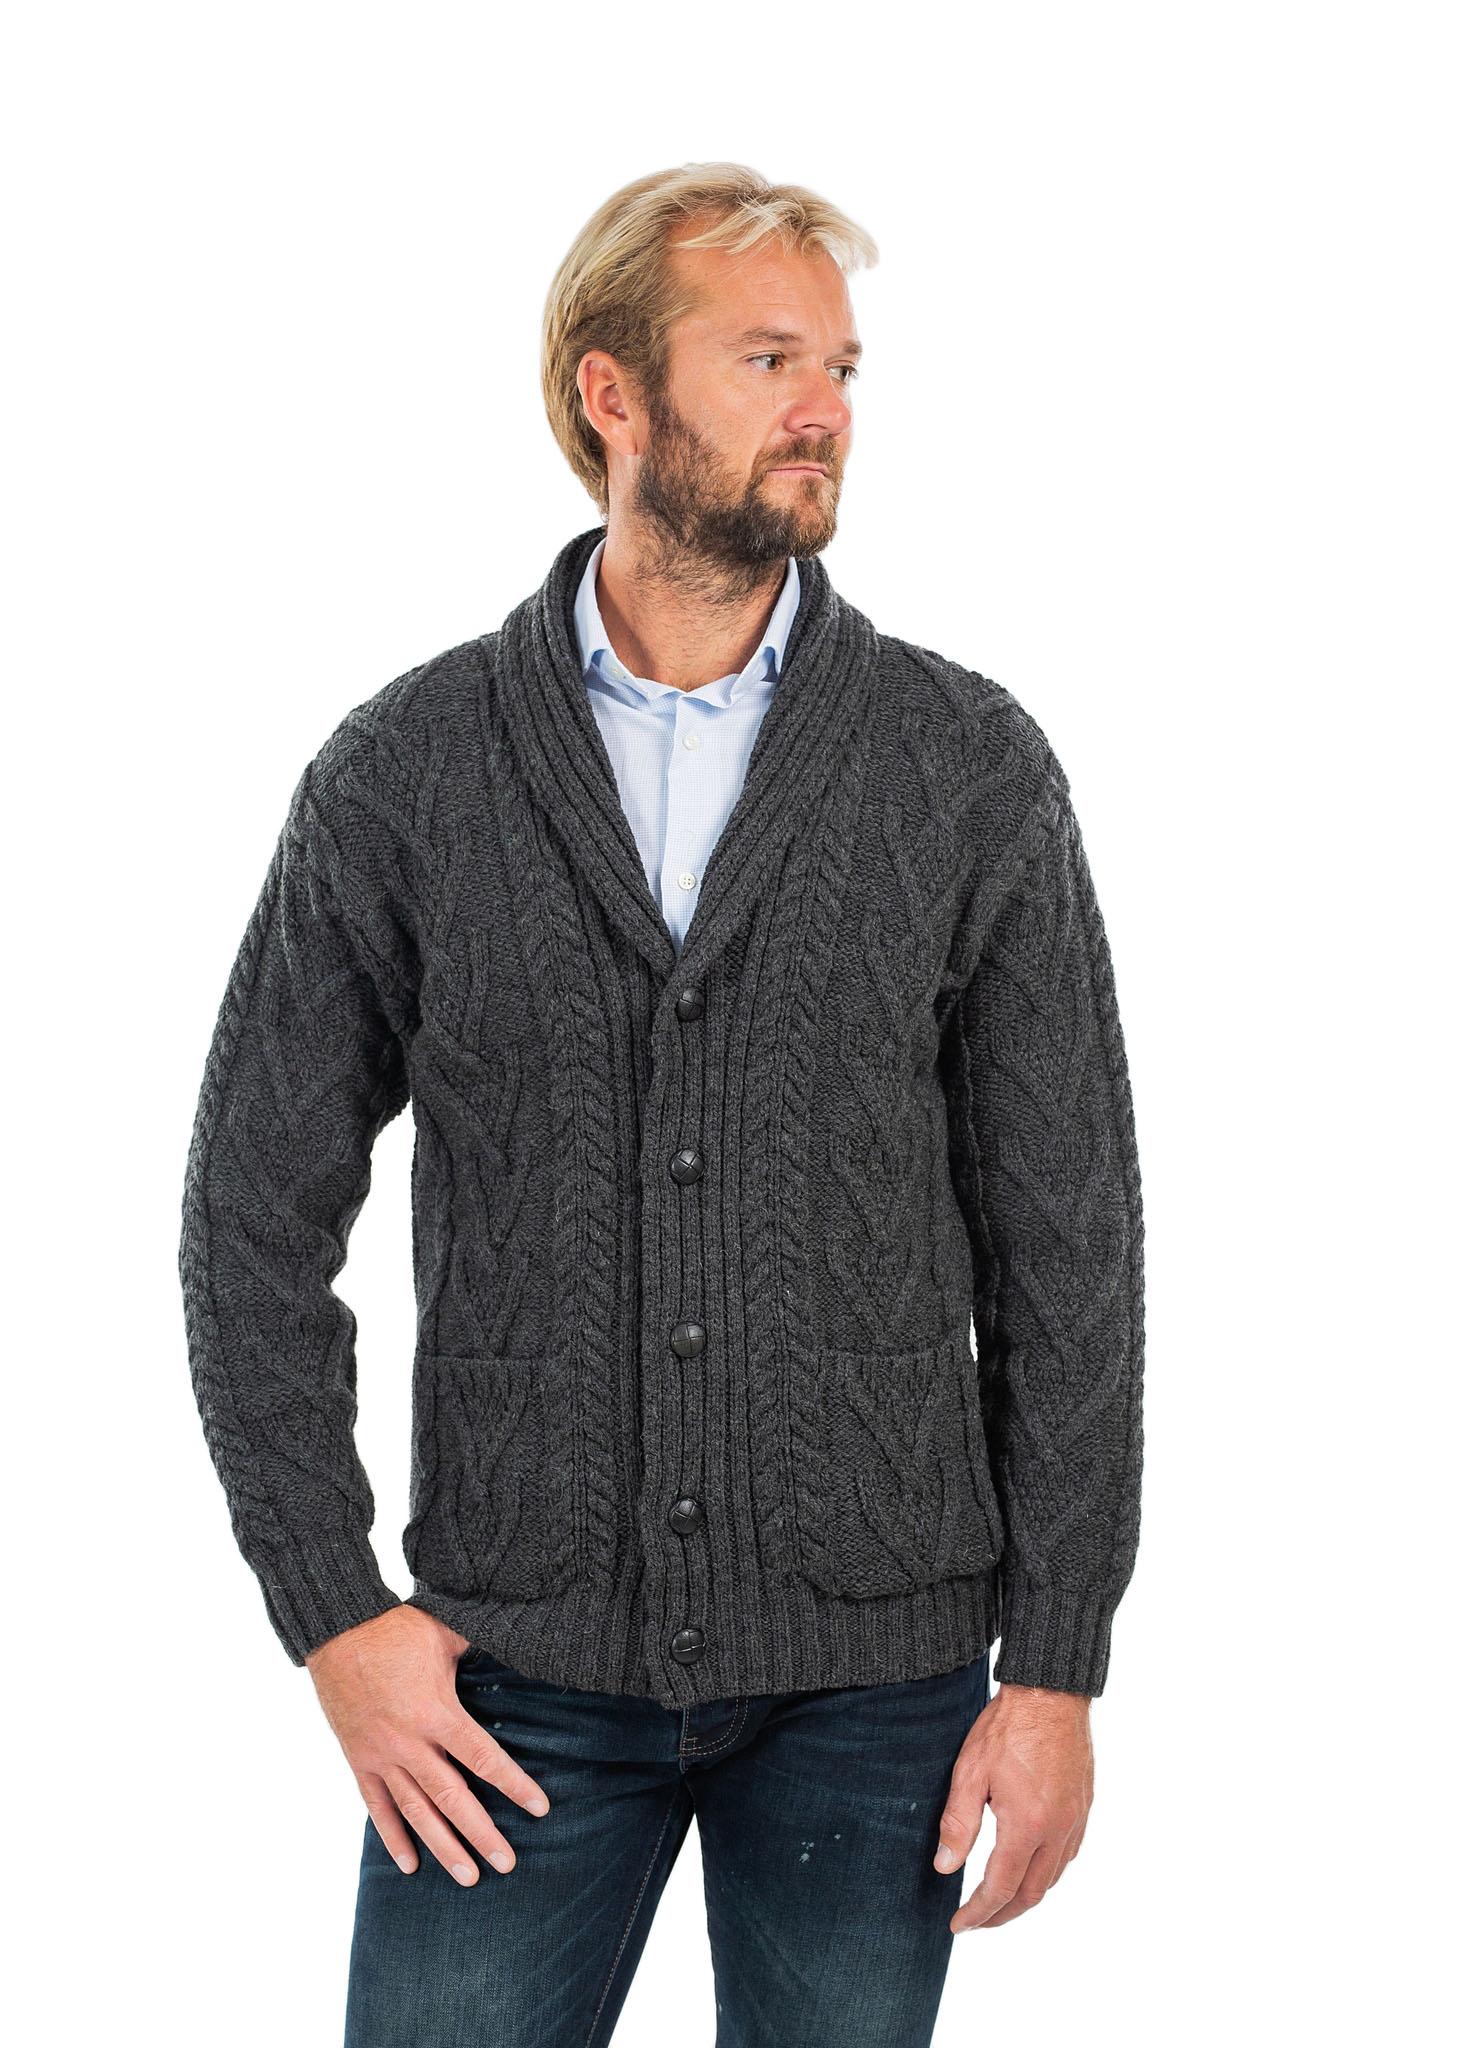 SAOL-Mens-Irish-Merino-Wool-Cardigan-Shawl-Collar-Front-Pockets-Aran-Cable-Knit thumbnail 38